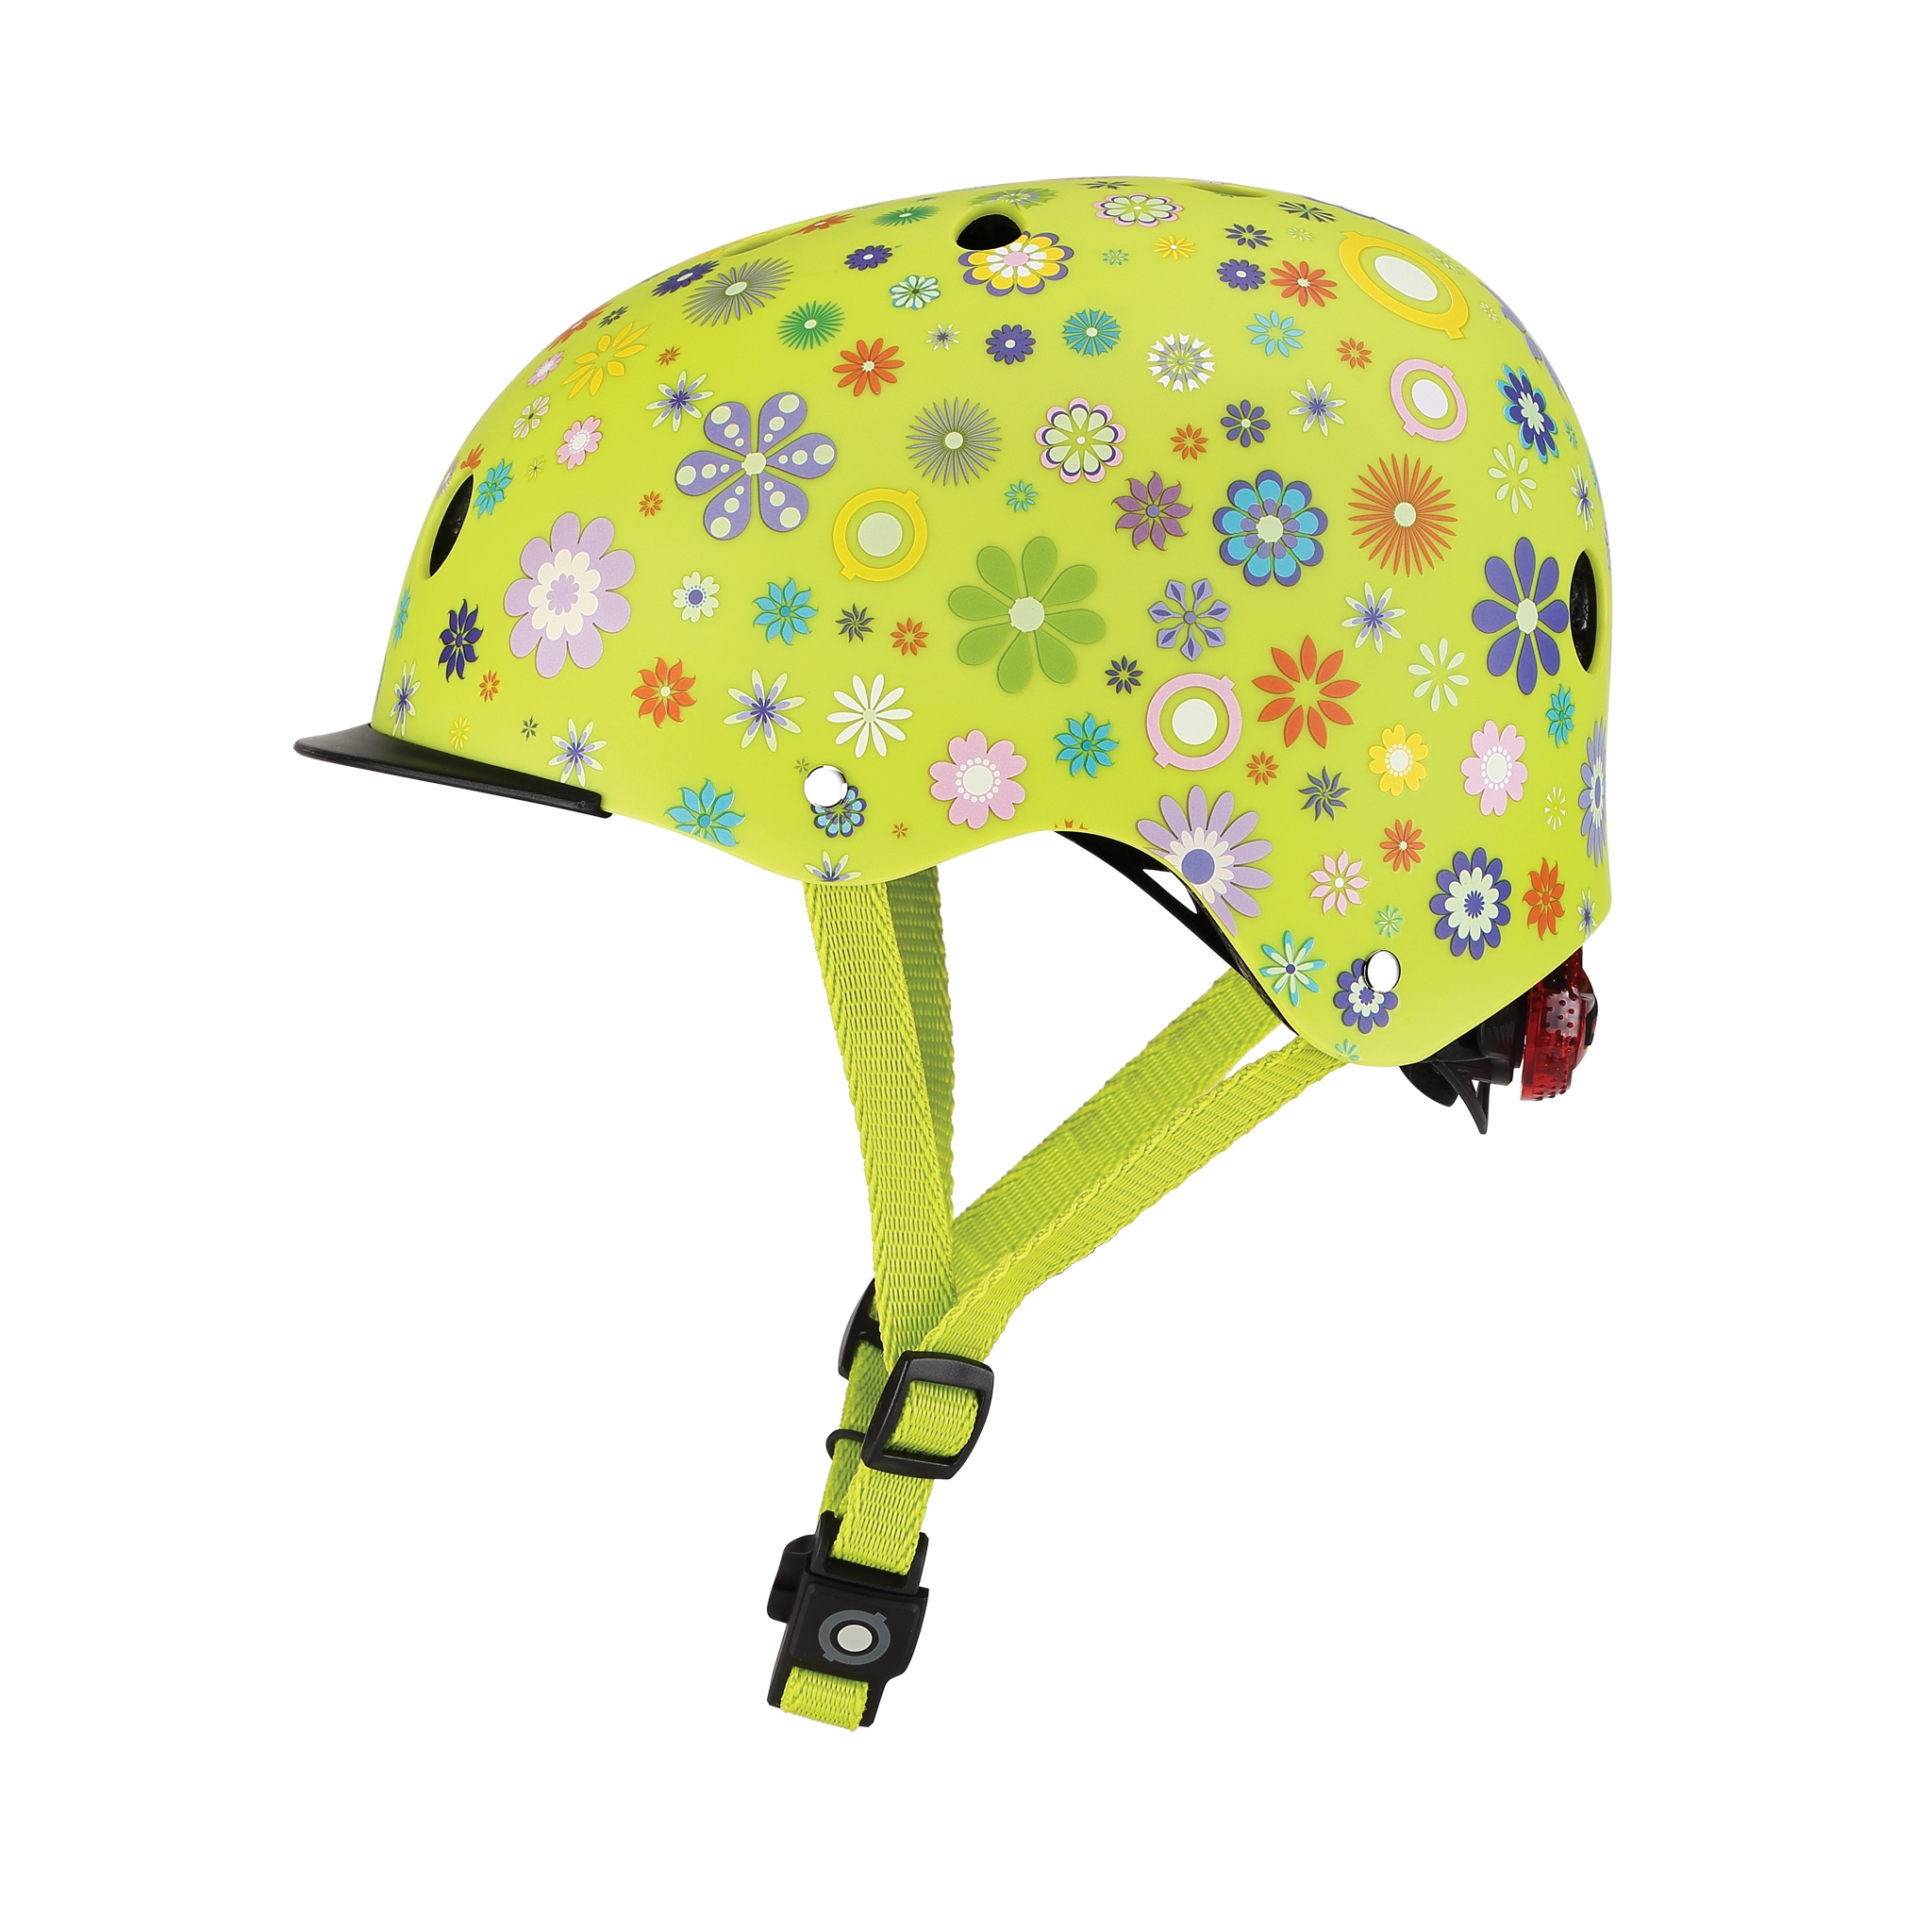 ELITE-helmets-scooter-helmets-for-kids-with-adjustable-helmet-knob-lime-green 1